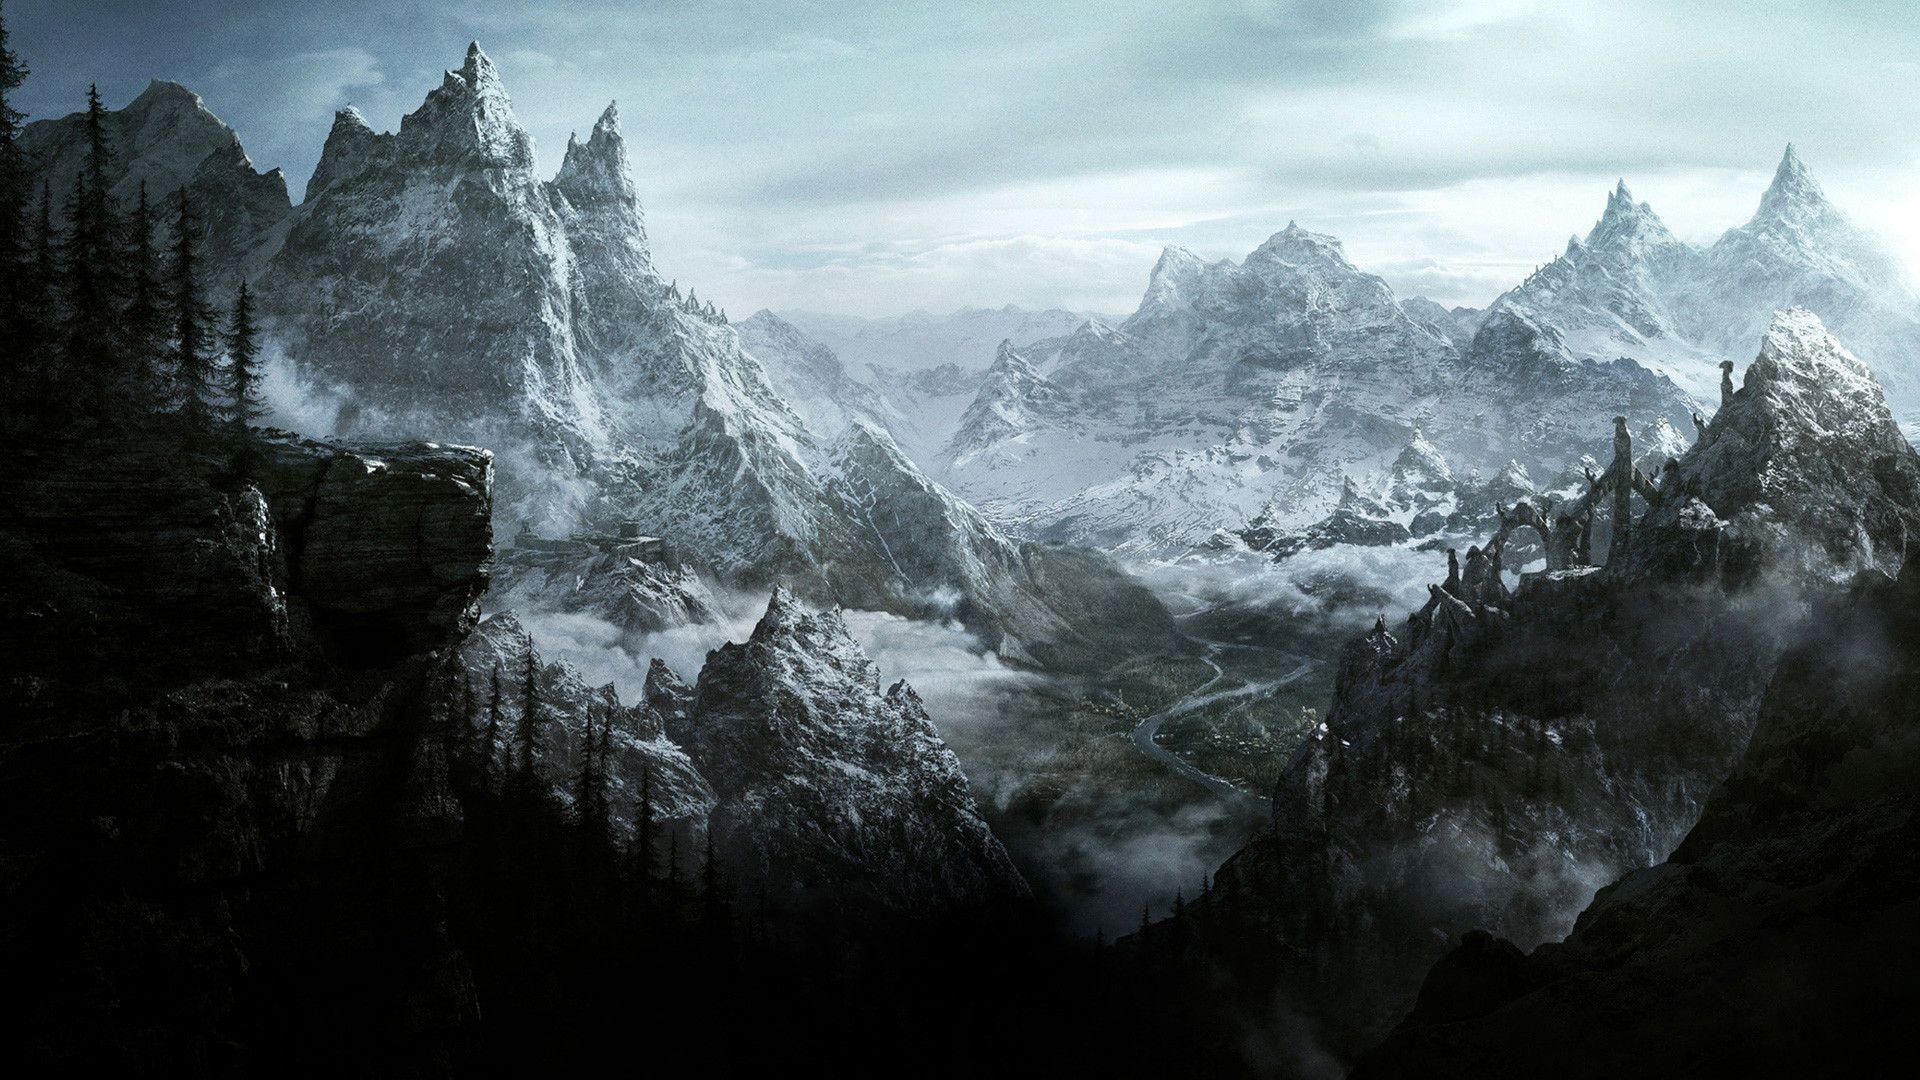 Skyrim 4K Wallpapers - Top Free Skyrim 4K Backgrounds